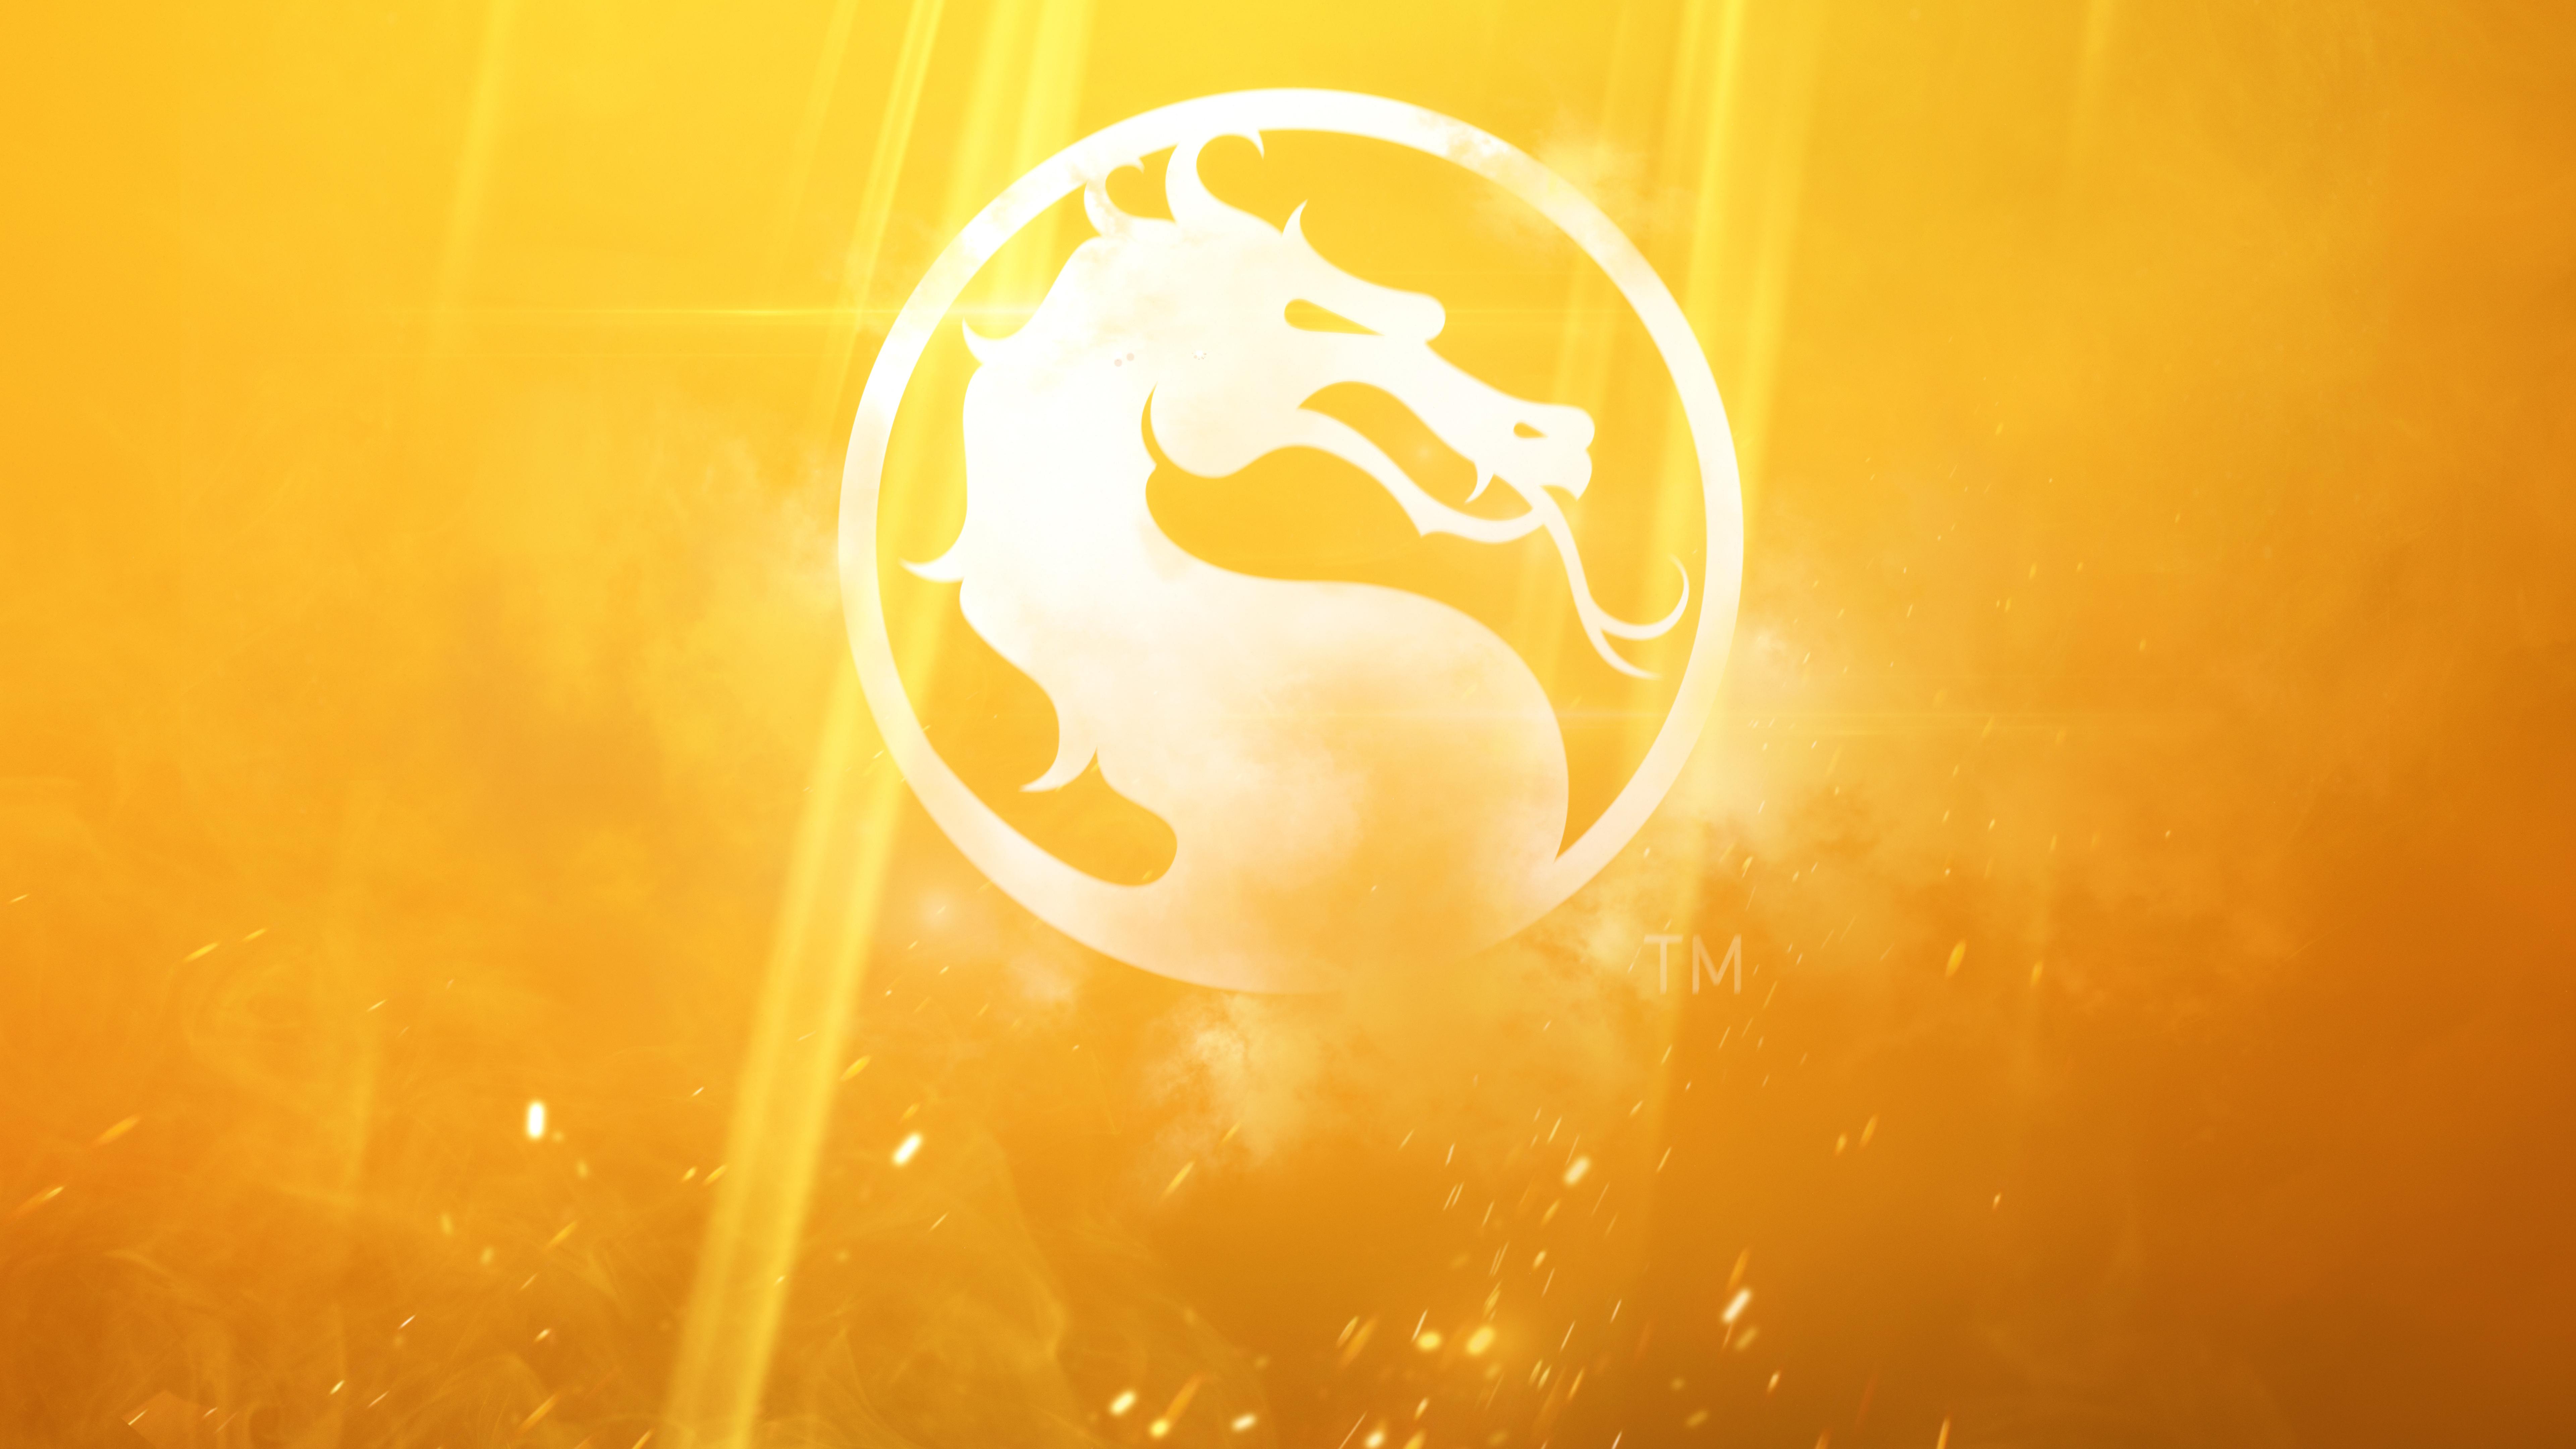 7680x4320 Mortal Kombat 11 Logo 8k Hd 4k Wallpapers Images